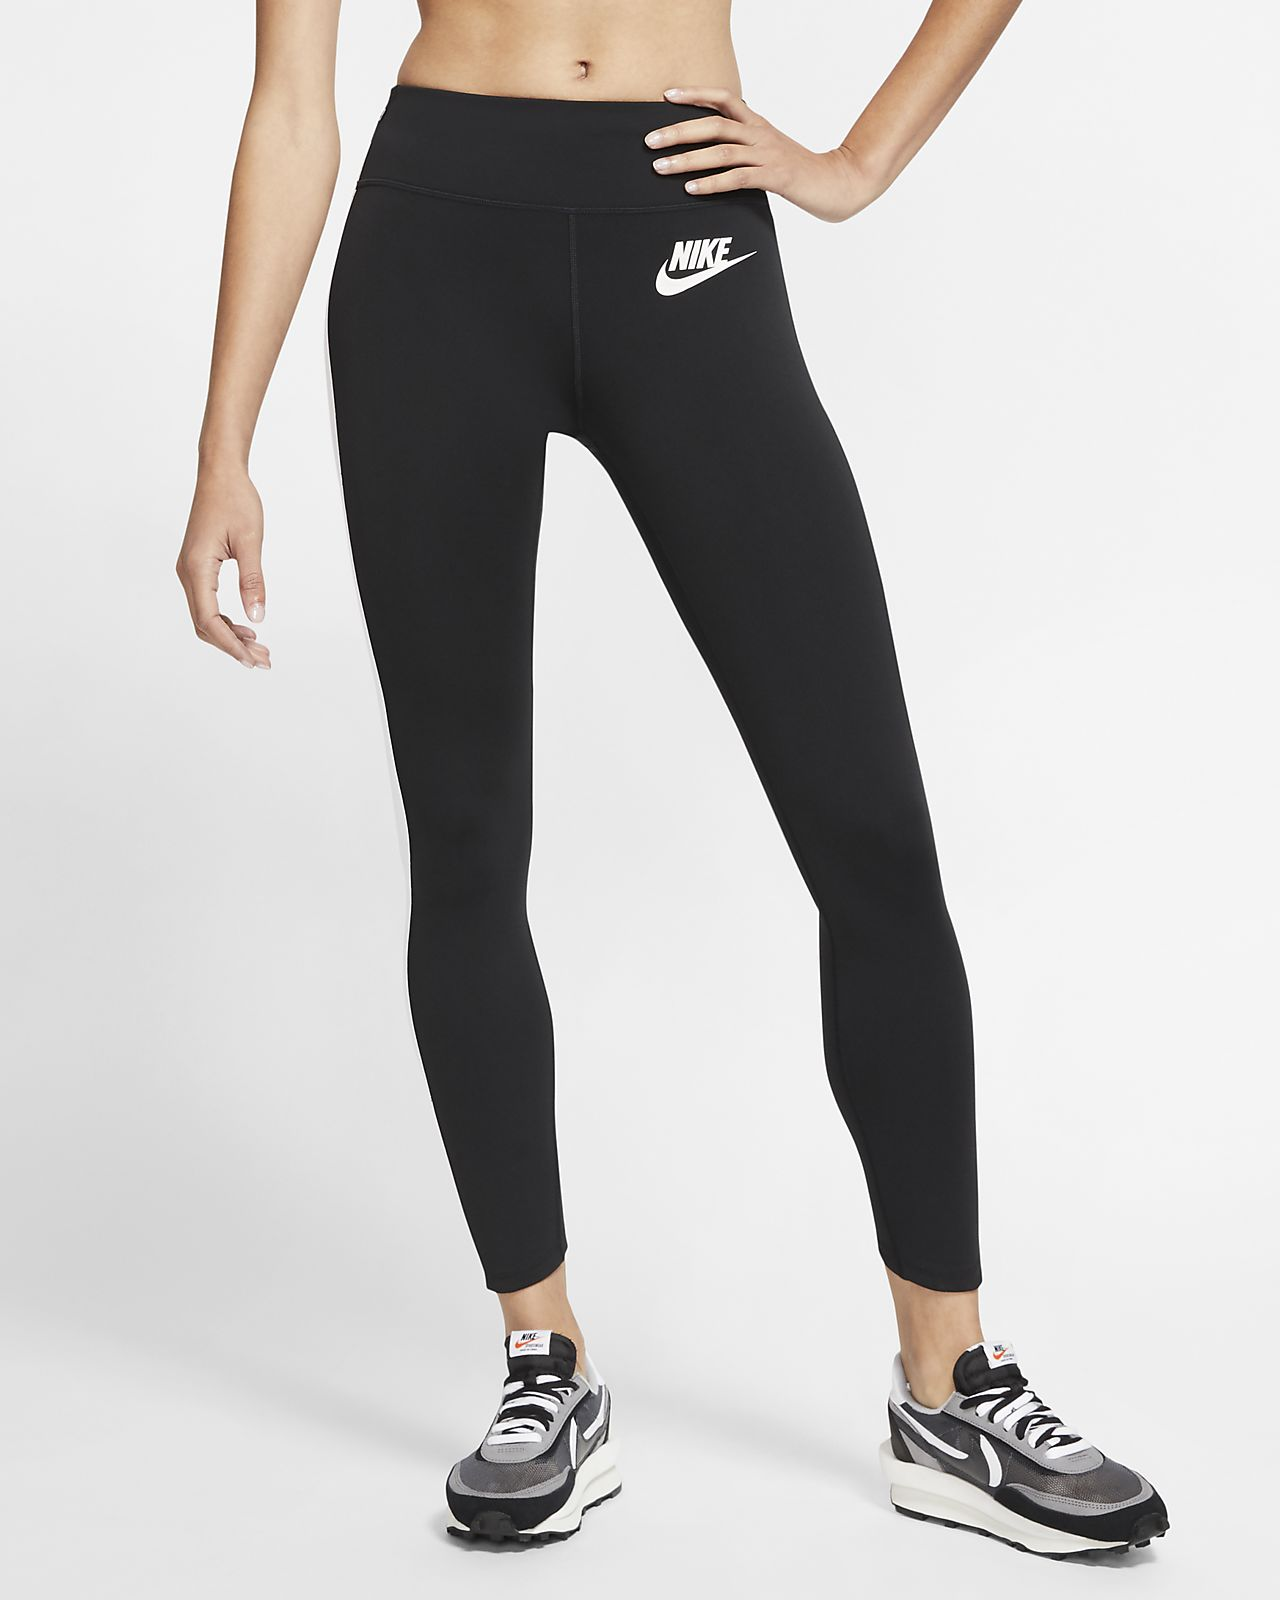 Dámské běžecké legíny Nike x Sacai